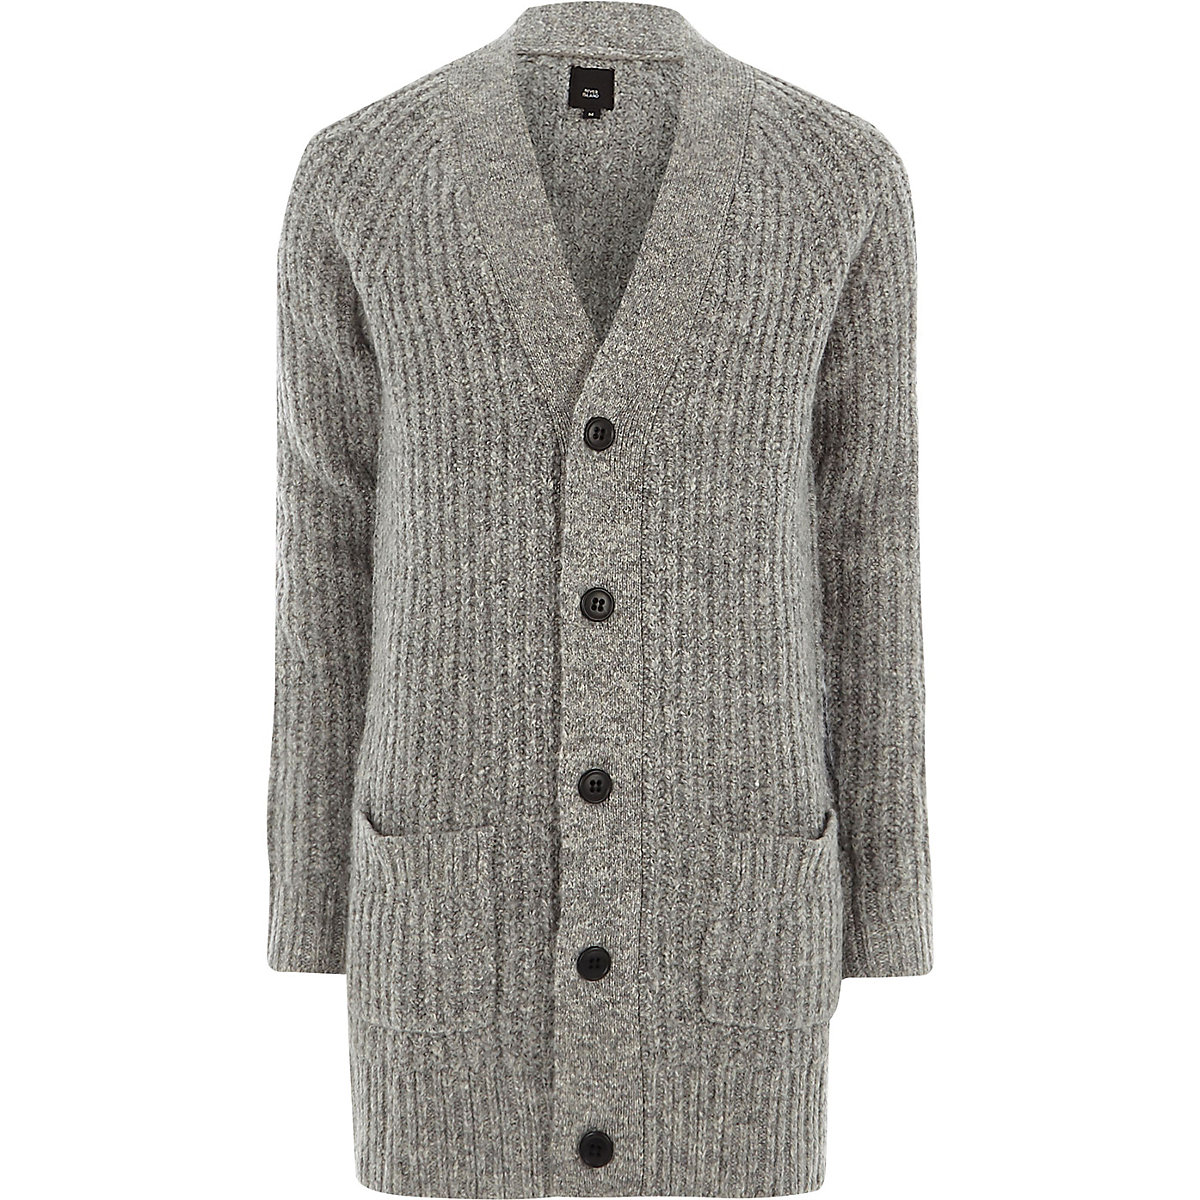 Grey long sleeve longline knit cardigan